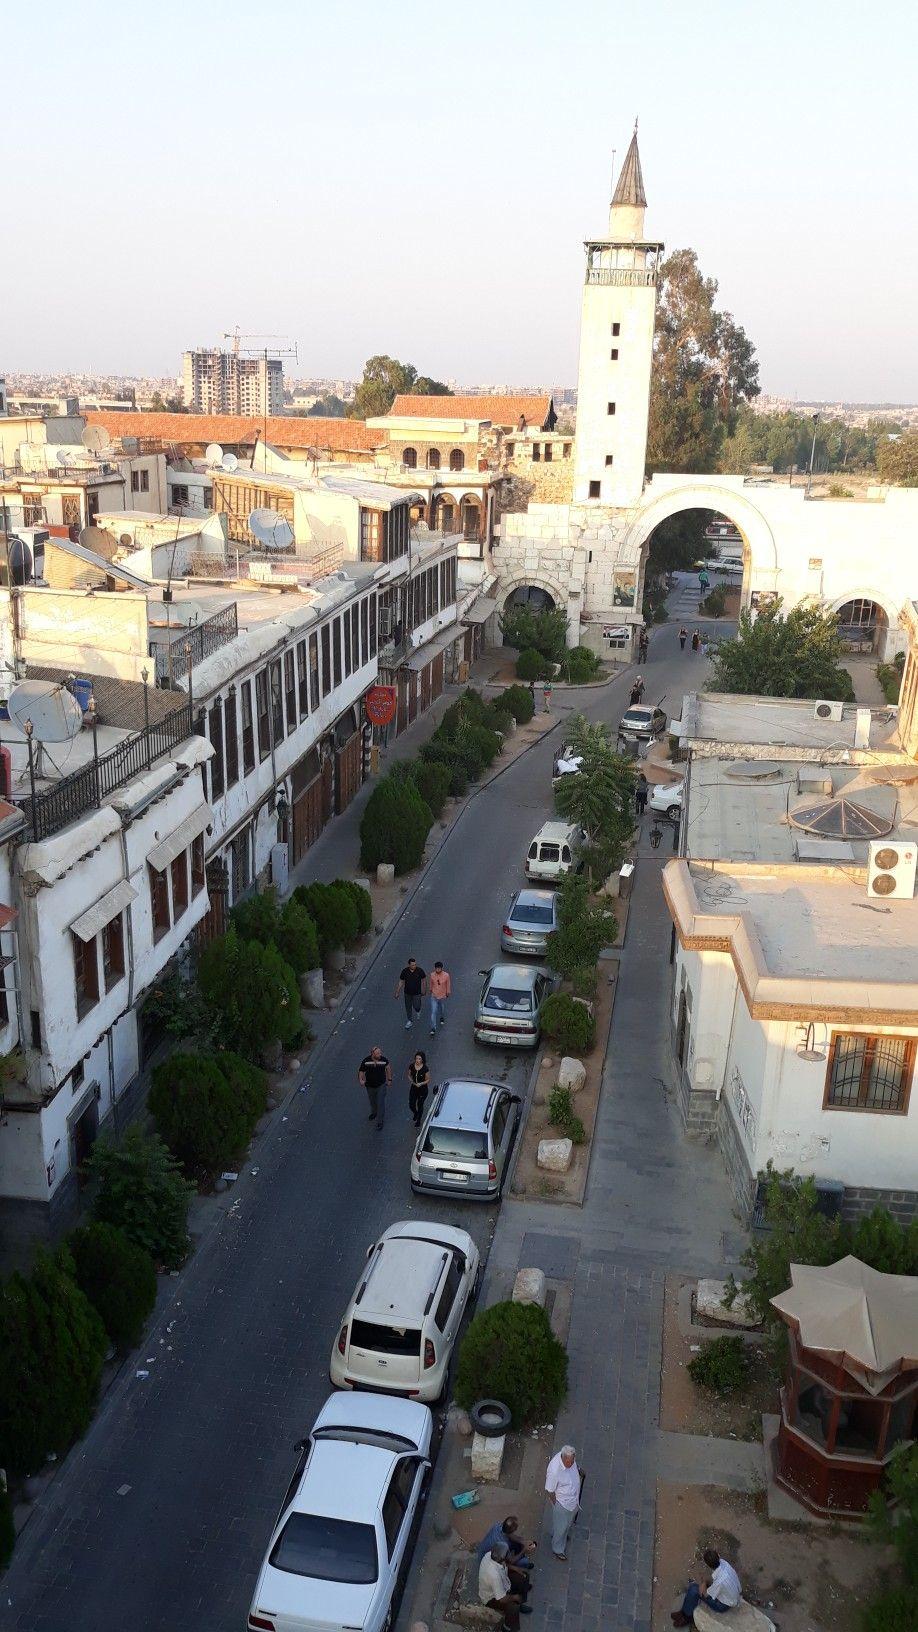 باب شرقي والشارع المستقيم ١٣ تموز ٢٠١٨ Old Damascuse In 2018